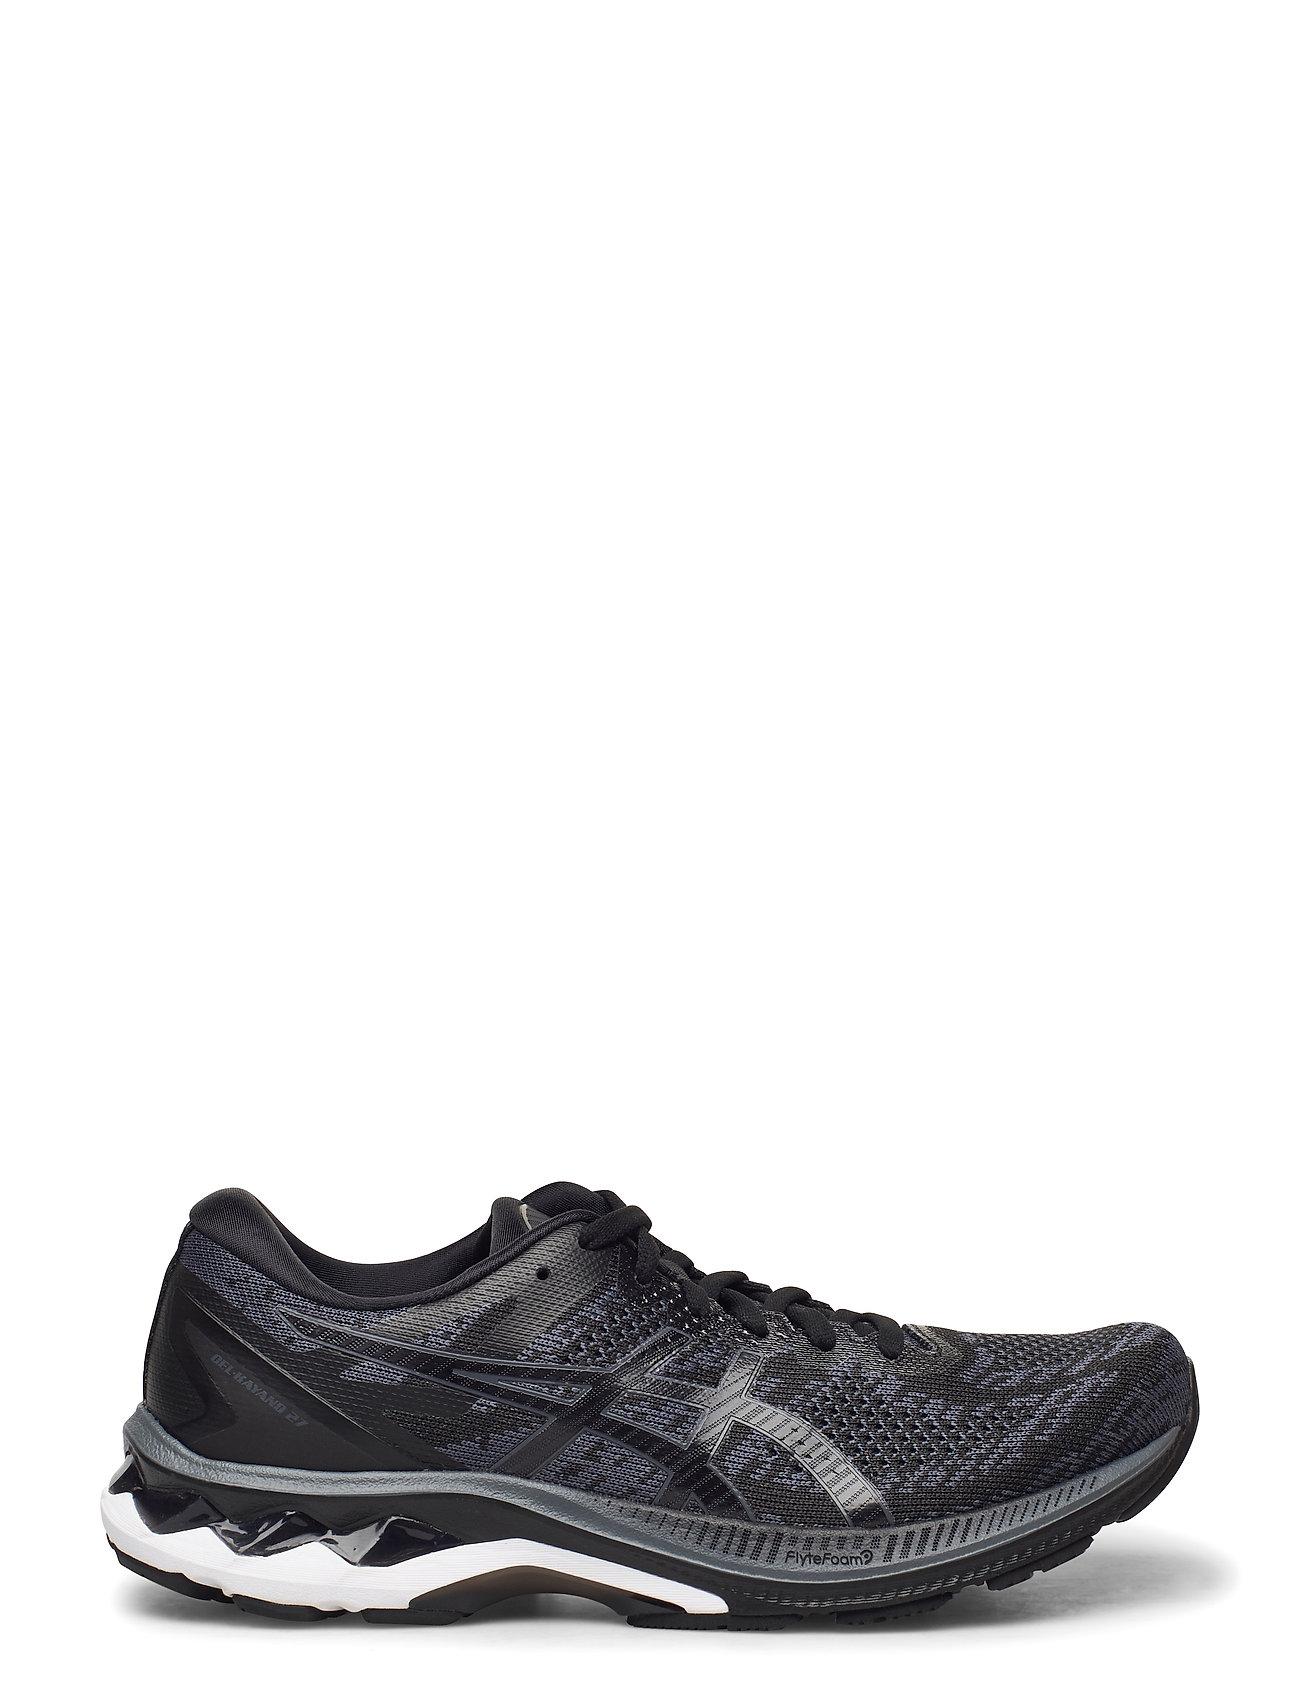 ASICS Sneaker | Gel-Kayano 27 Mk Shoes Sport Shoes Running Shoes Schwarz ASICS